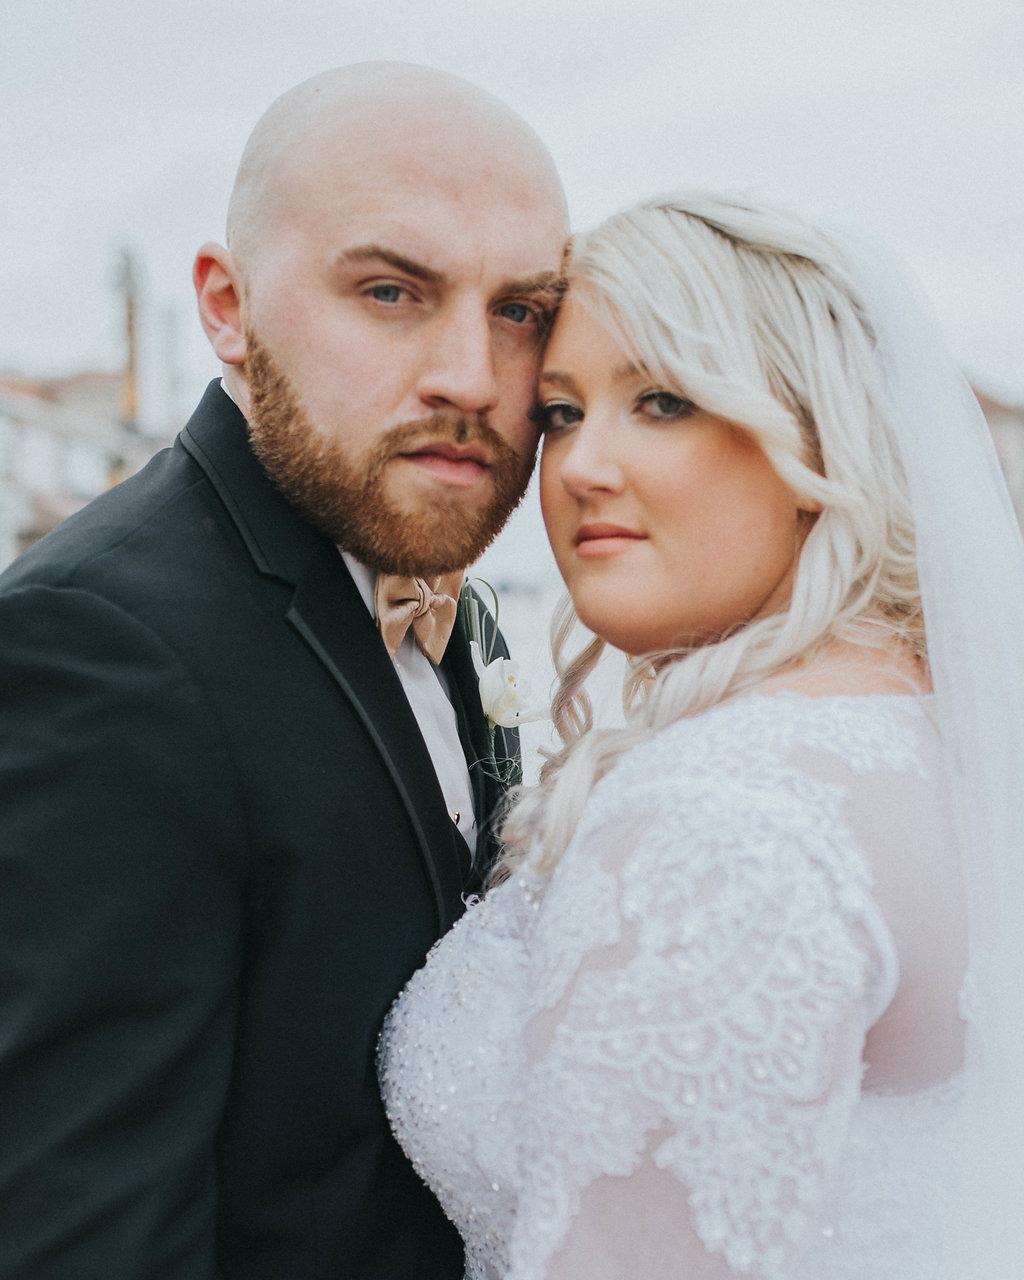 Morgan-and-Cory-Ocean-City-Wedding-160.jpg